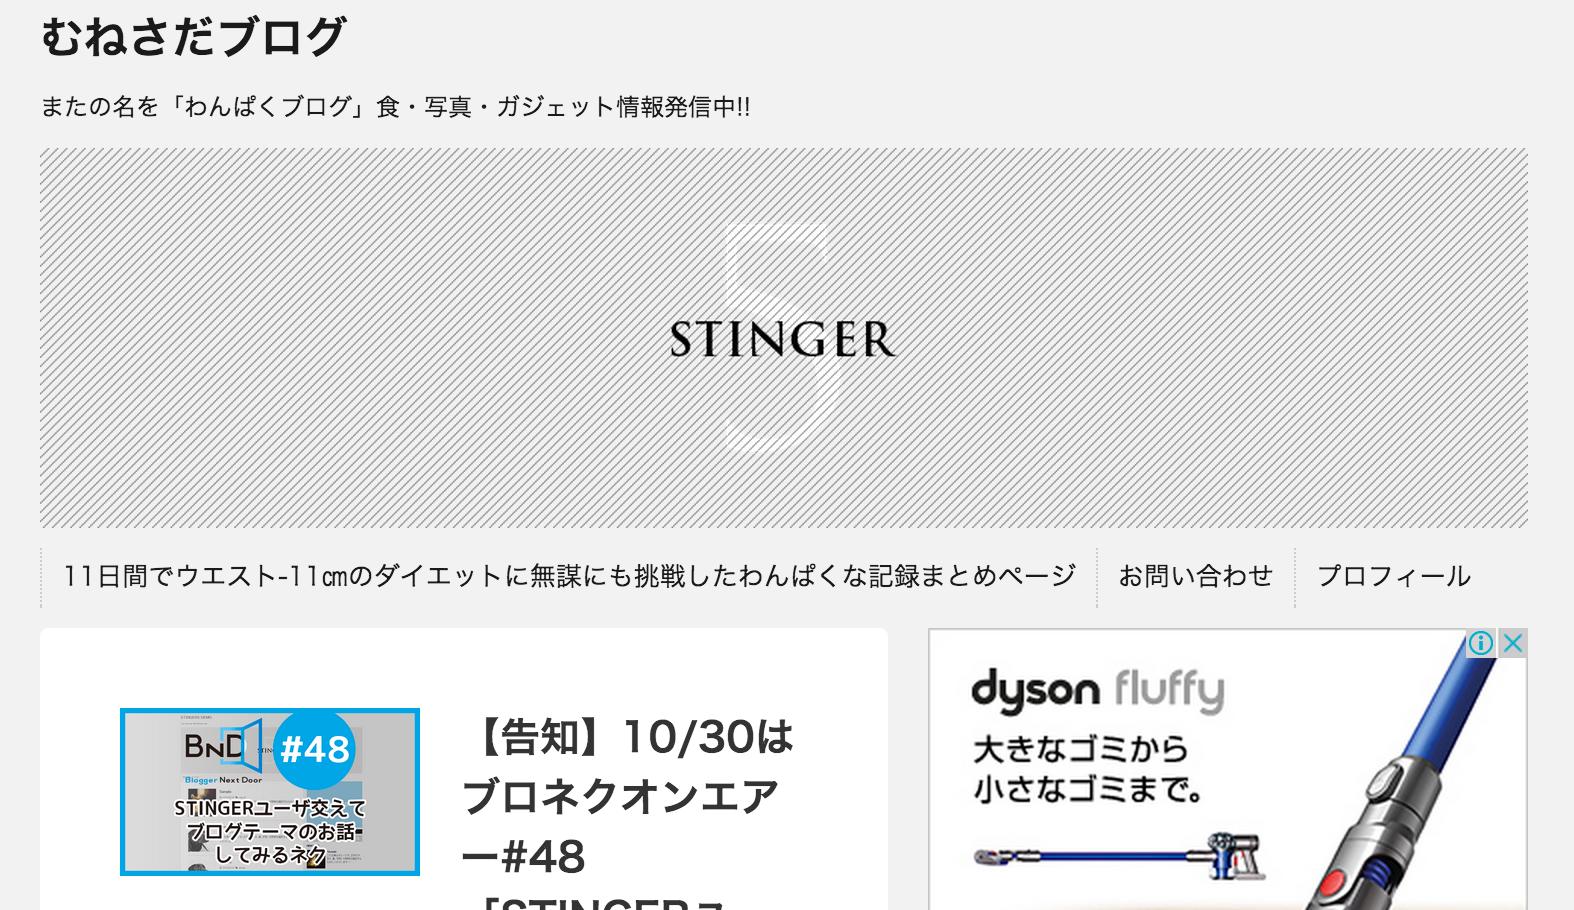 stinger5ver20141011_のカスタマイズ_—_WordPress